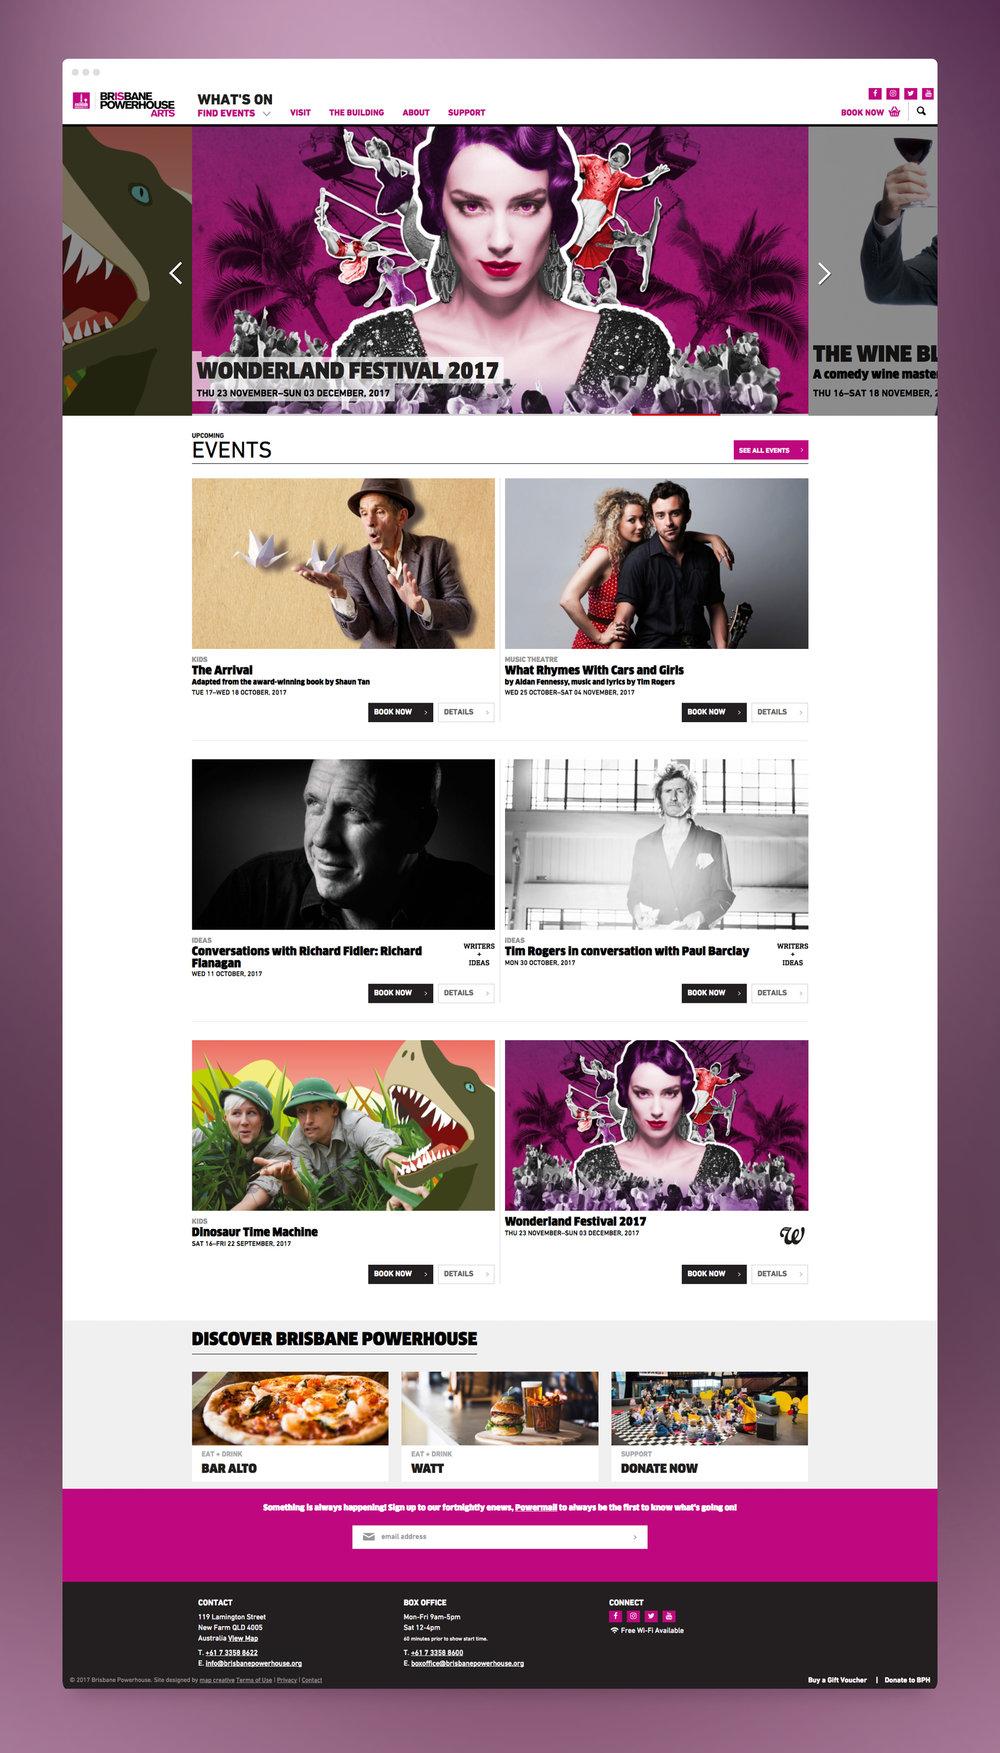 map-creative-brisbane-powerhouse-website-2.jpg